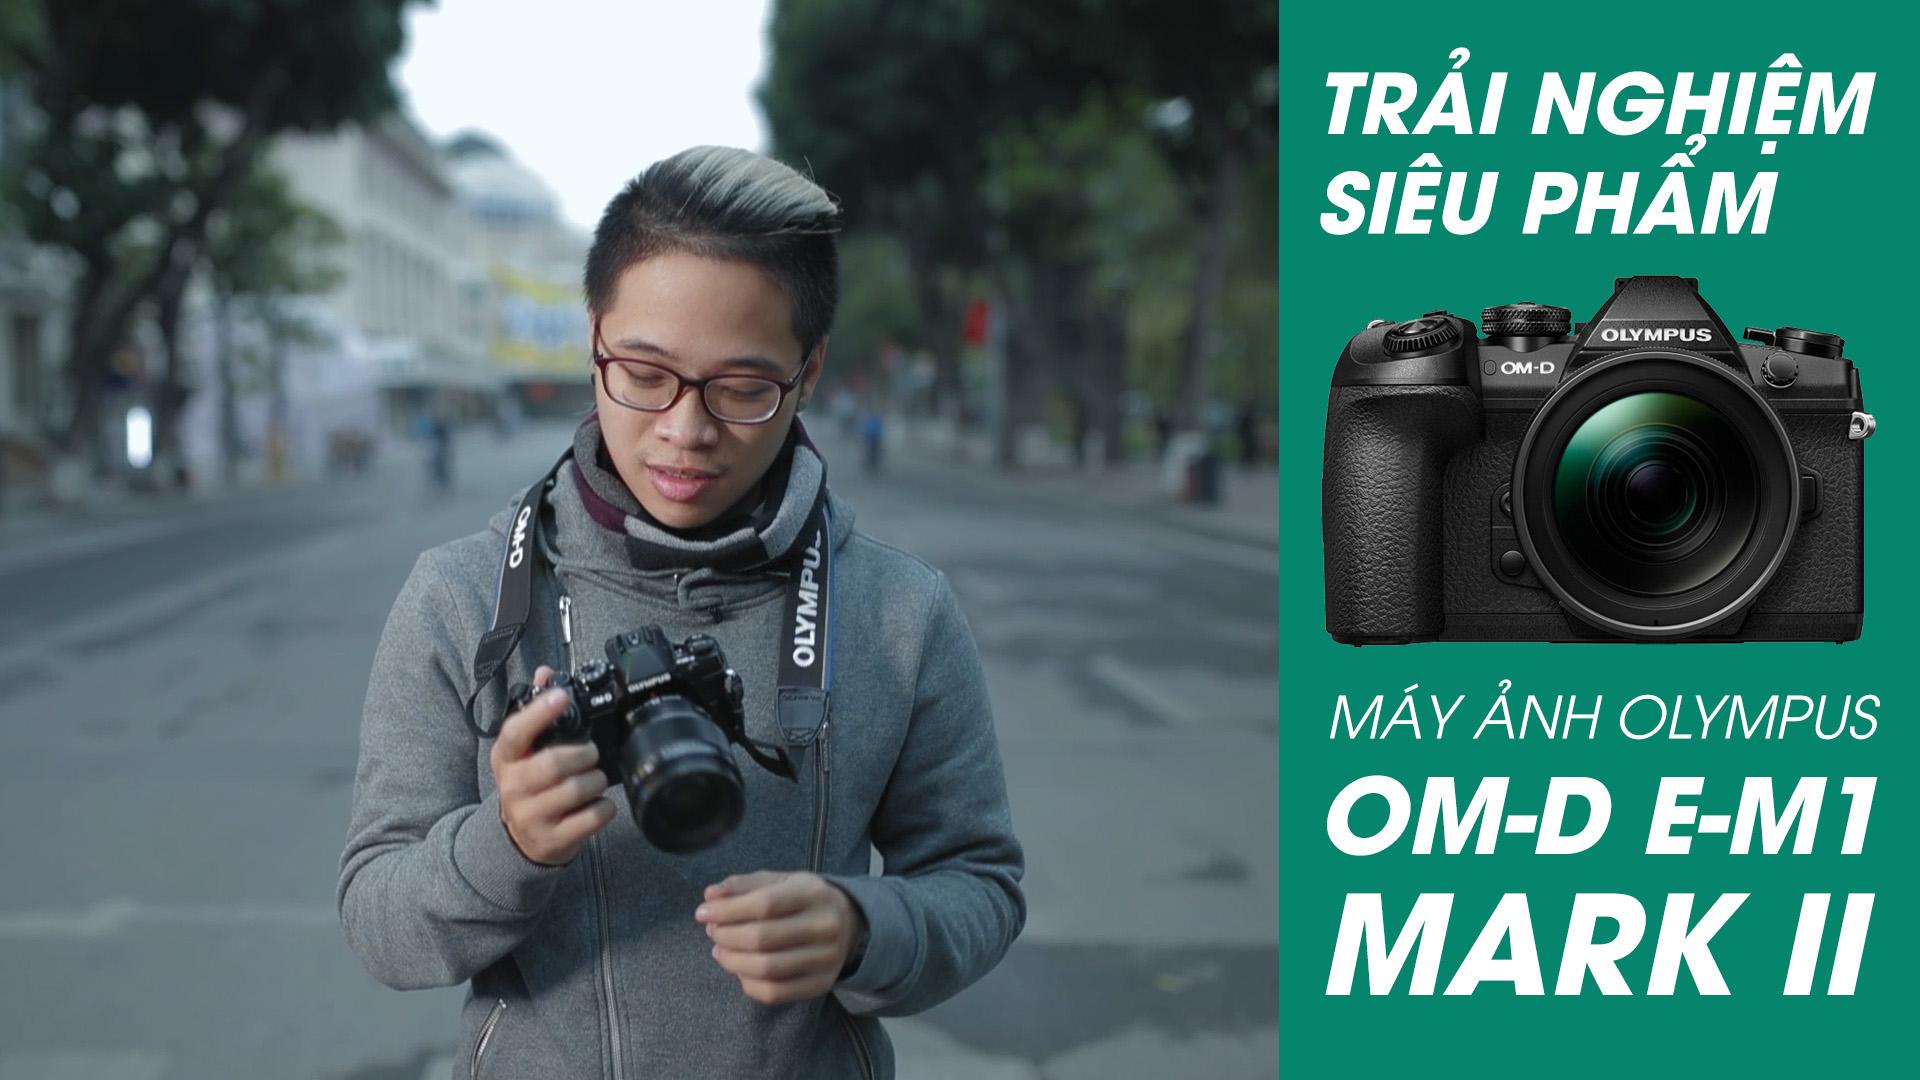 [Video] Review siêu phẩm Olympus OM-D E-M1 Mark II | 50mm Vietnam Official Site